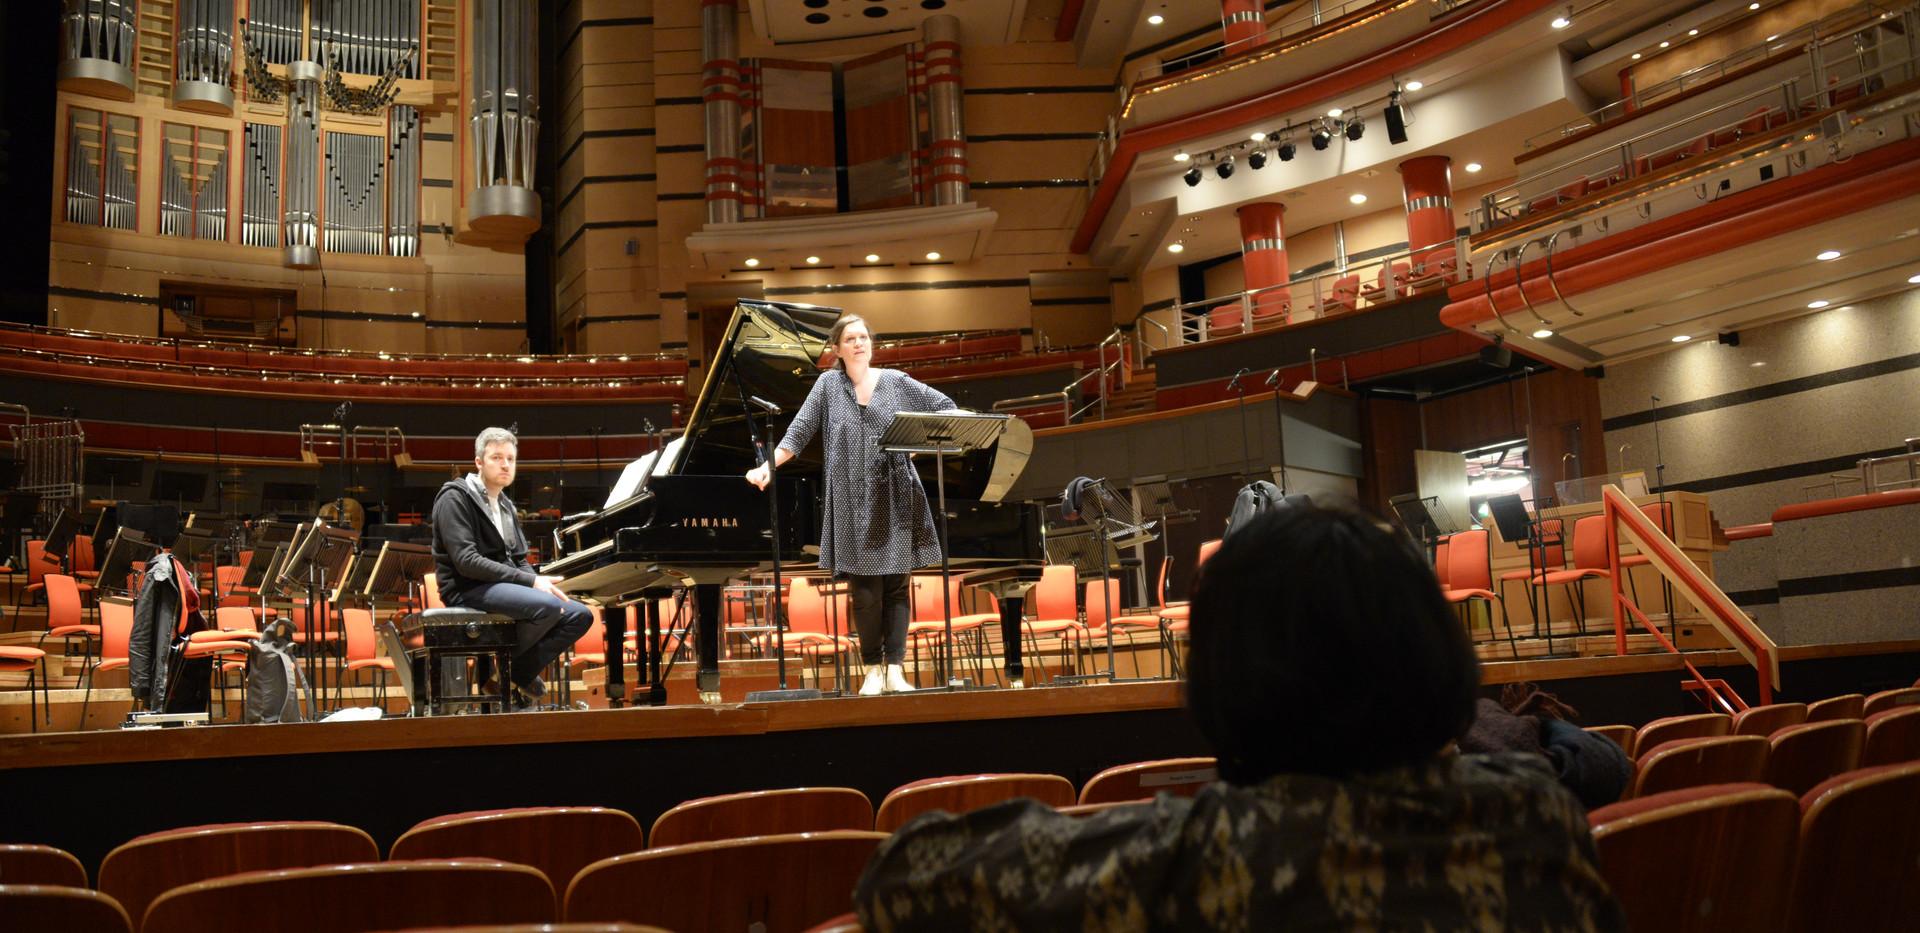 Premiere Tagore Fireflies op Debussy Festival in the Symphonyhall in Birmingham